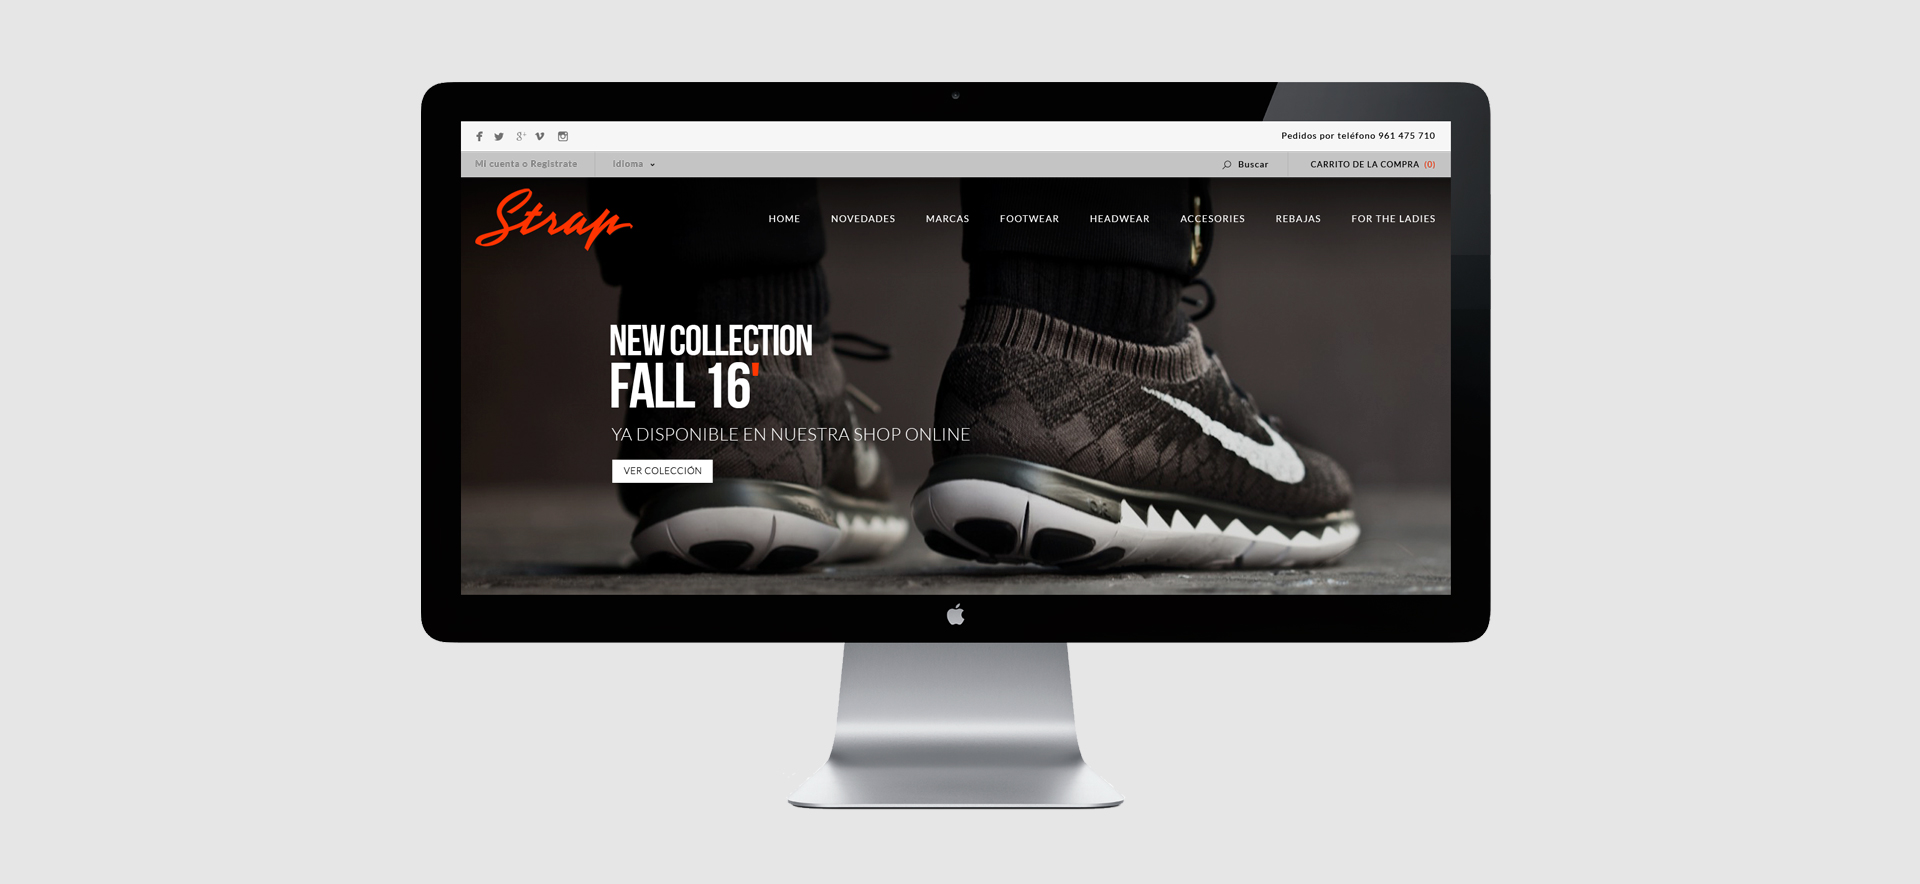 Strap-tienda-online-similar